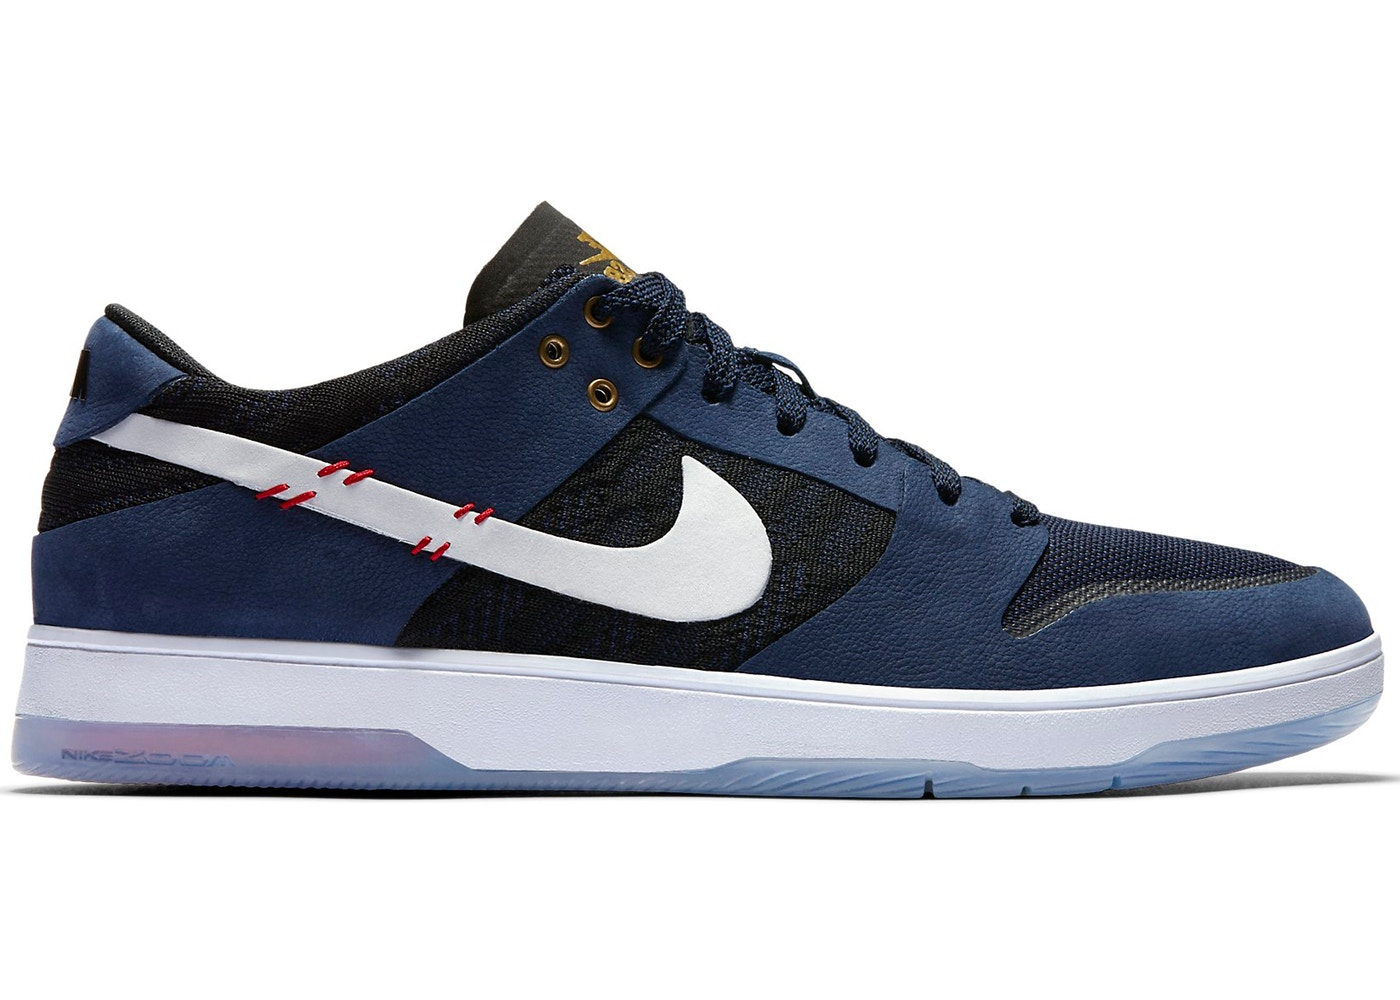 polilla contrabando León  Nike SB Dunk Low Elite Sean Malto - 877063-416